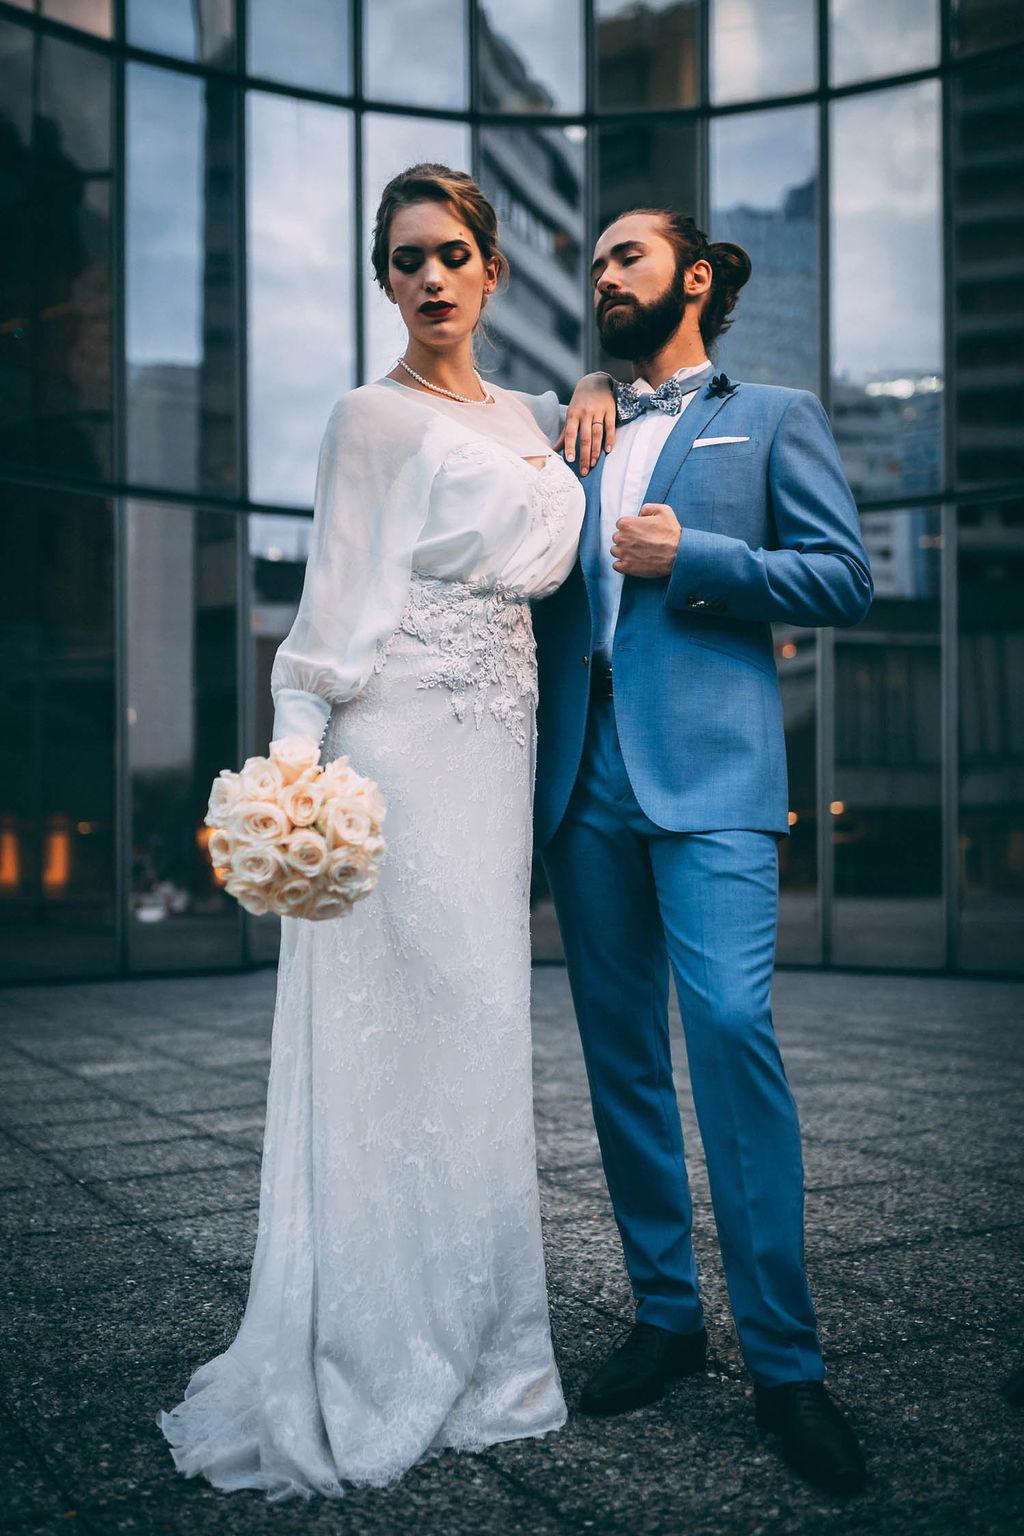 3_2_chic_urbain_couple_4_looks_sidneyonthemoon_photographe_chrisvonmartial_robe_mariee_costume_paris_wedding_web.jpg